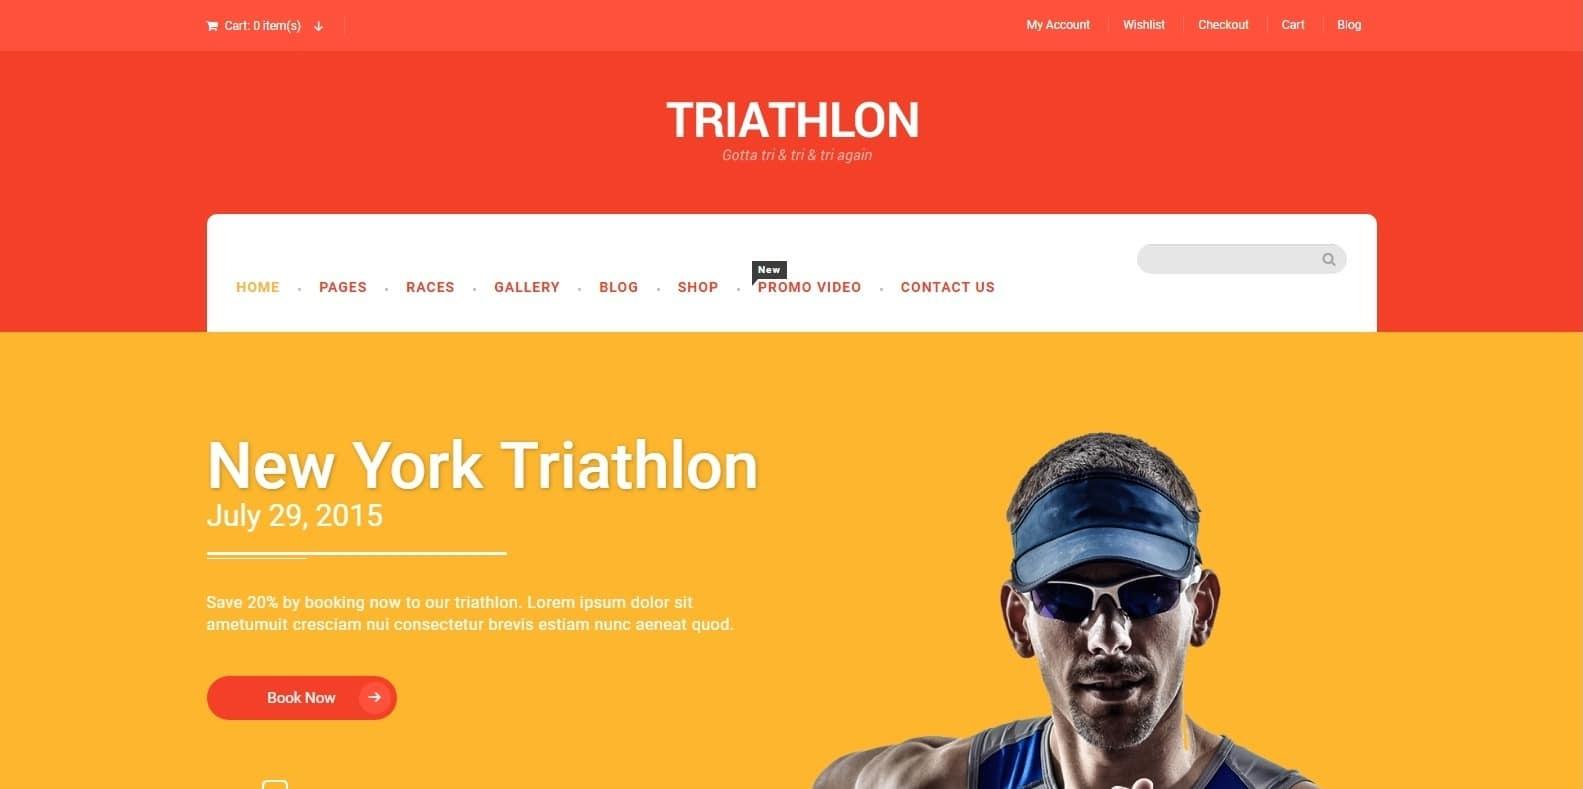 triathlon-sports-website-template